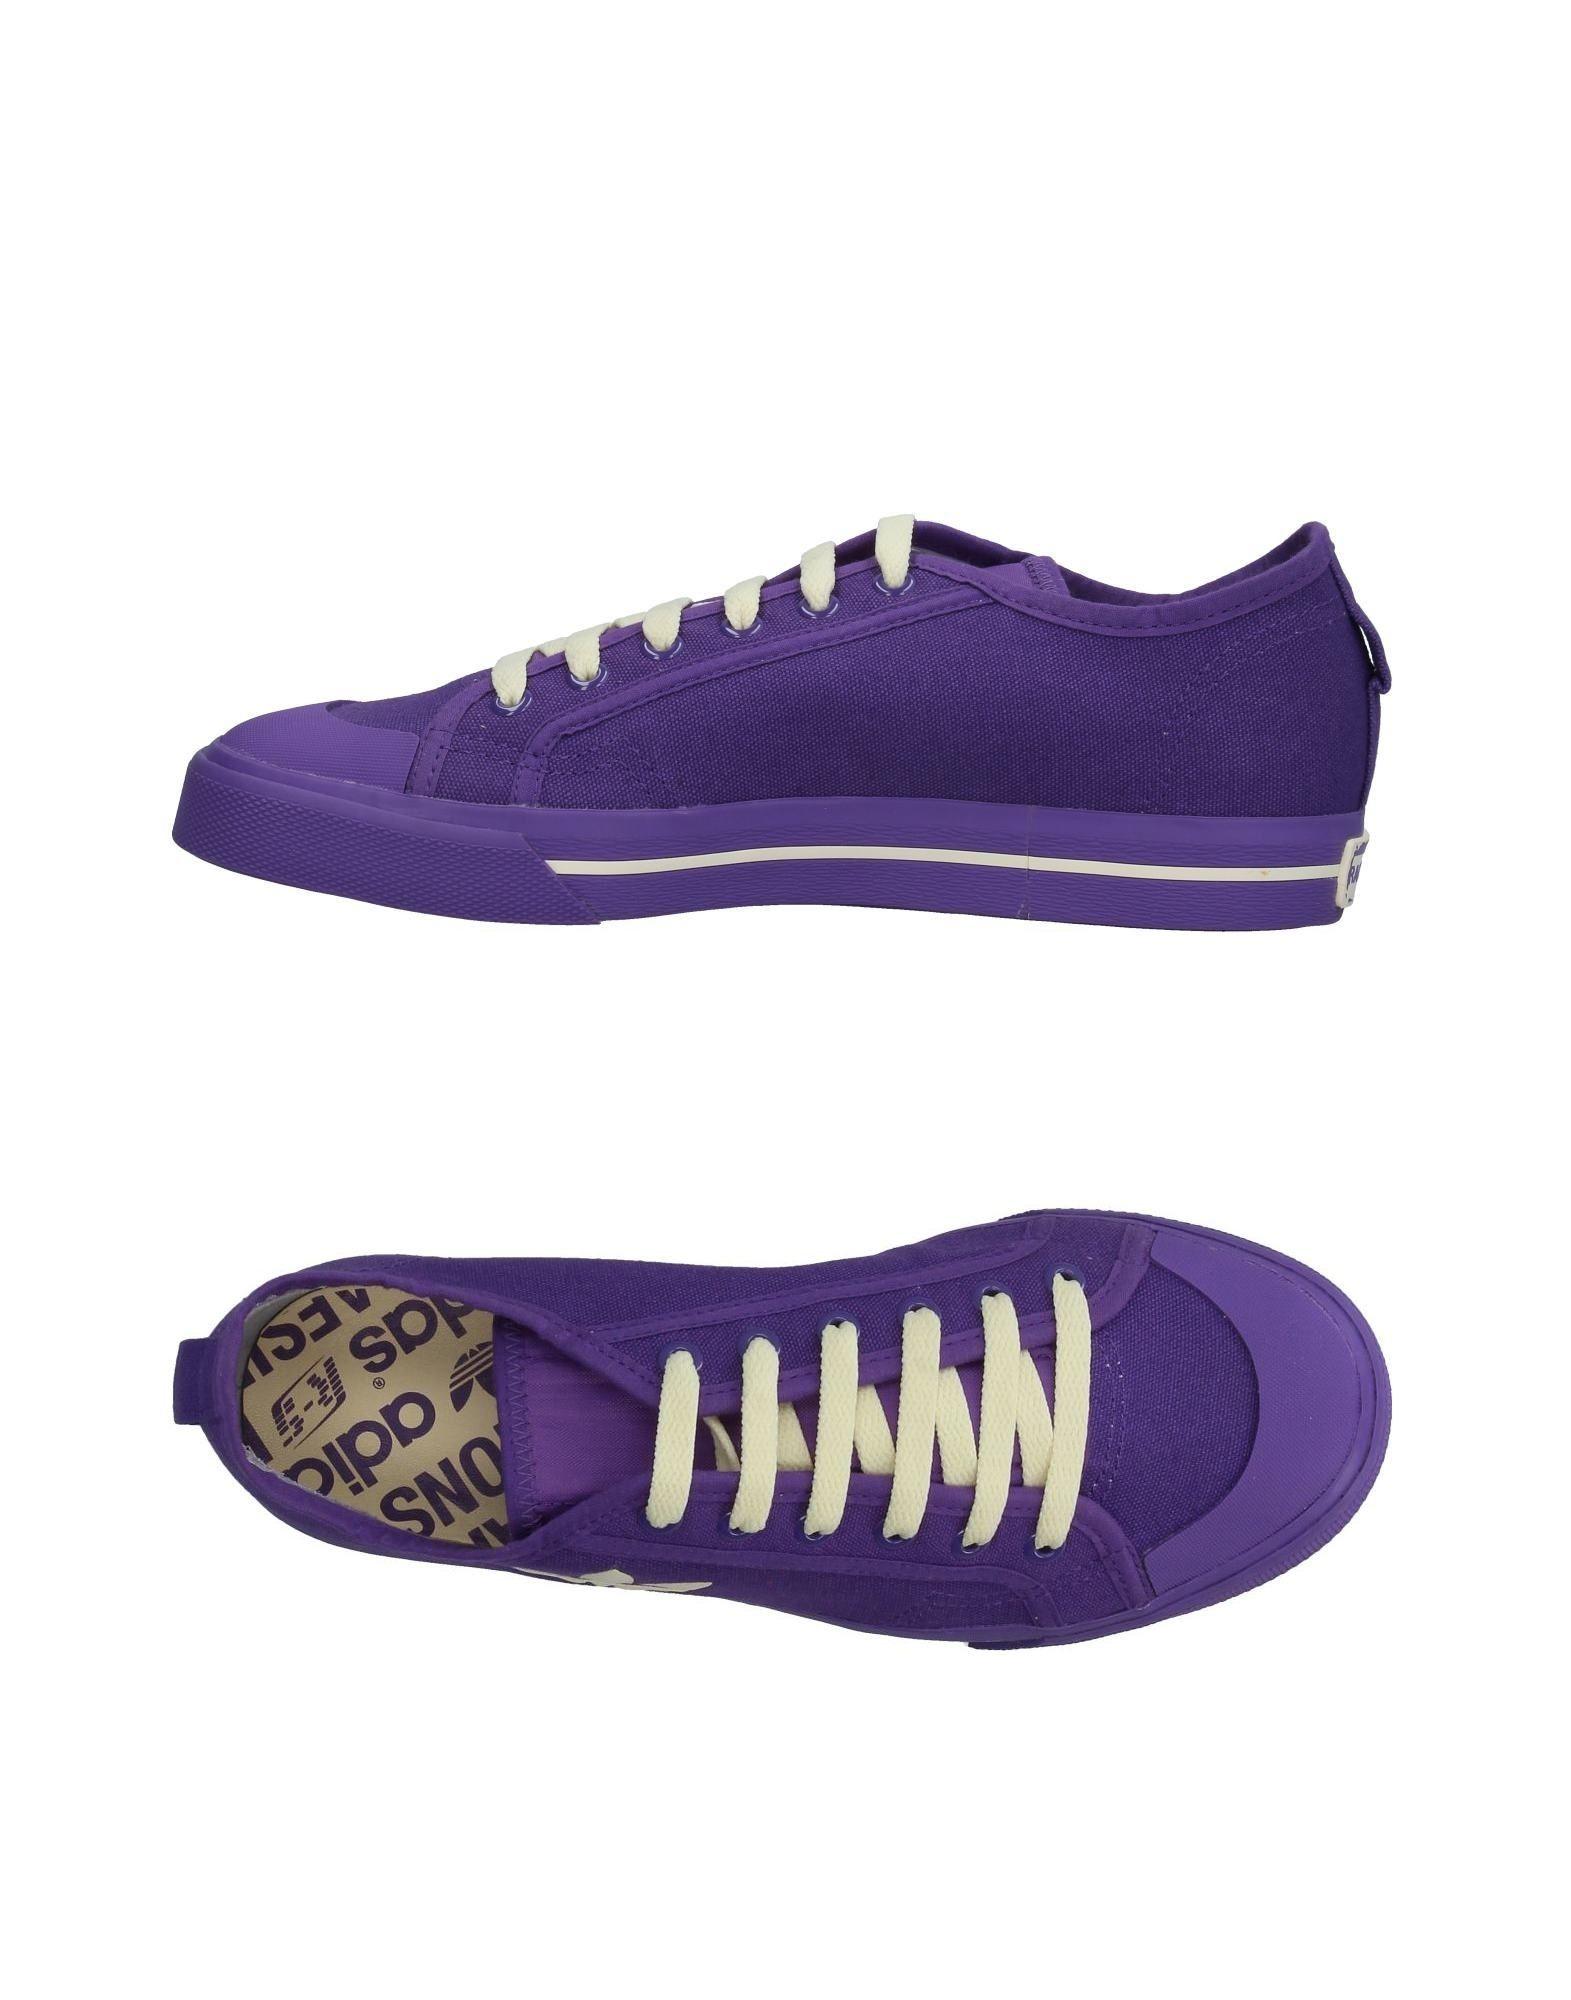 Sneakers Adidas By Raf Simons Homme - Sneakers Adidas By Raf Simons sur